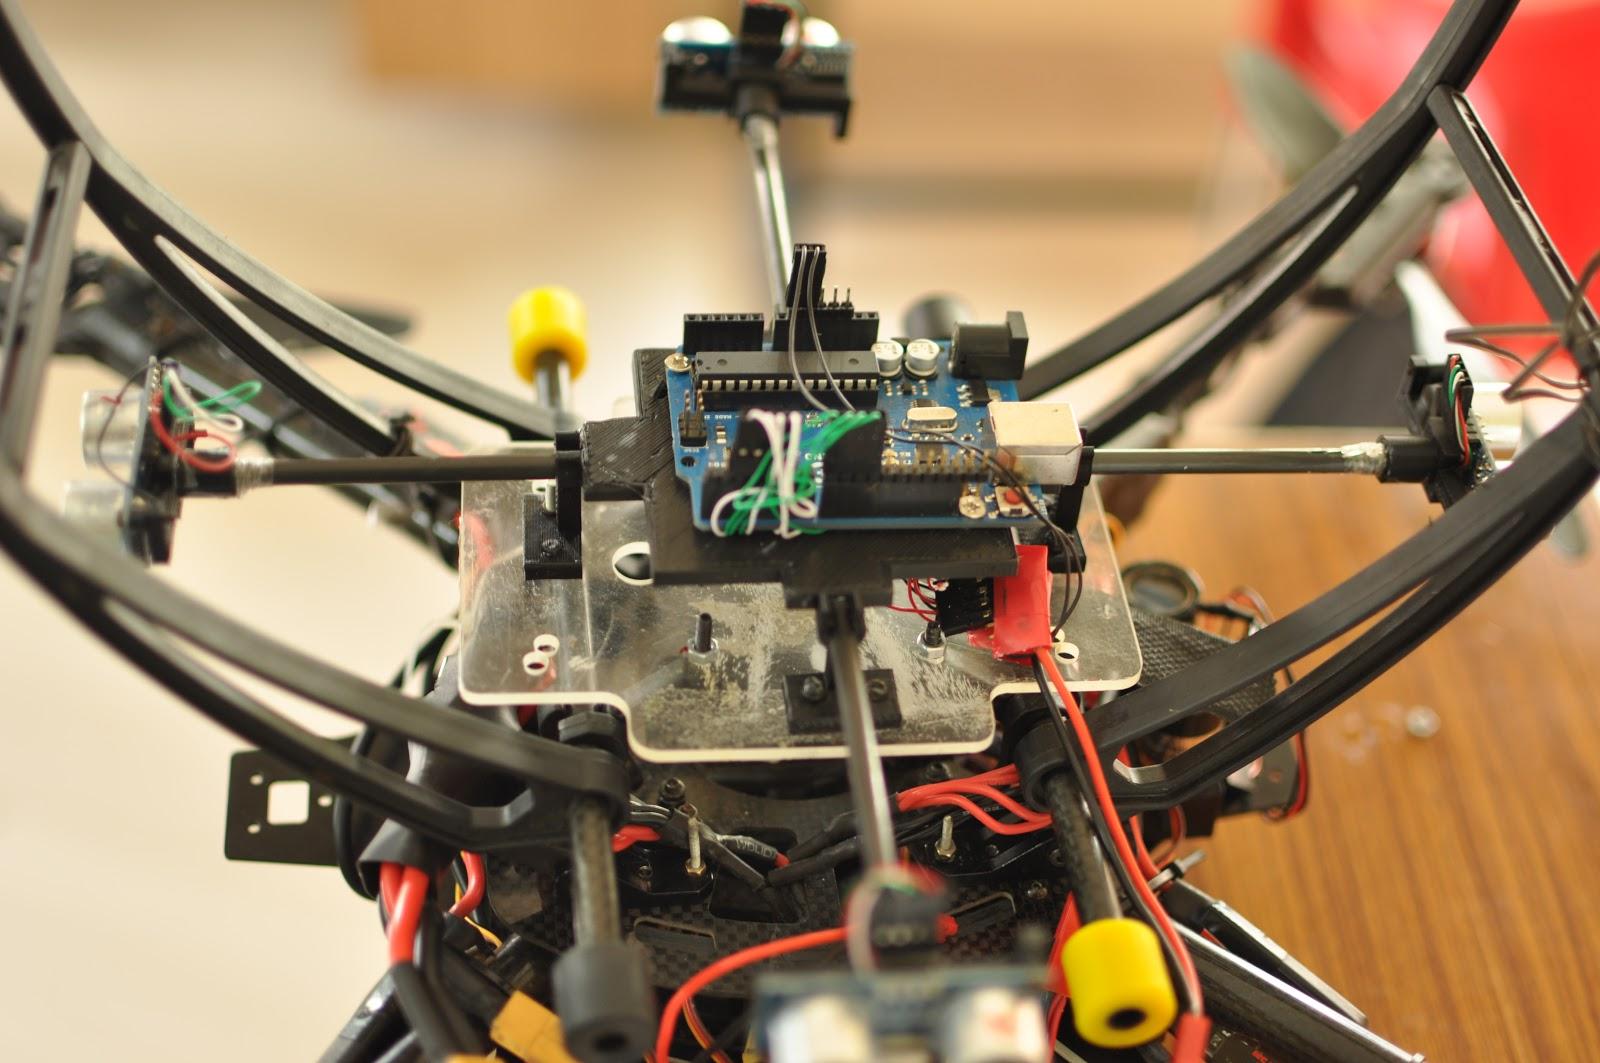 sonar_jig_on_drone.JPG